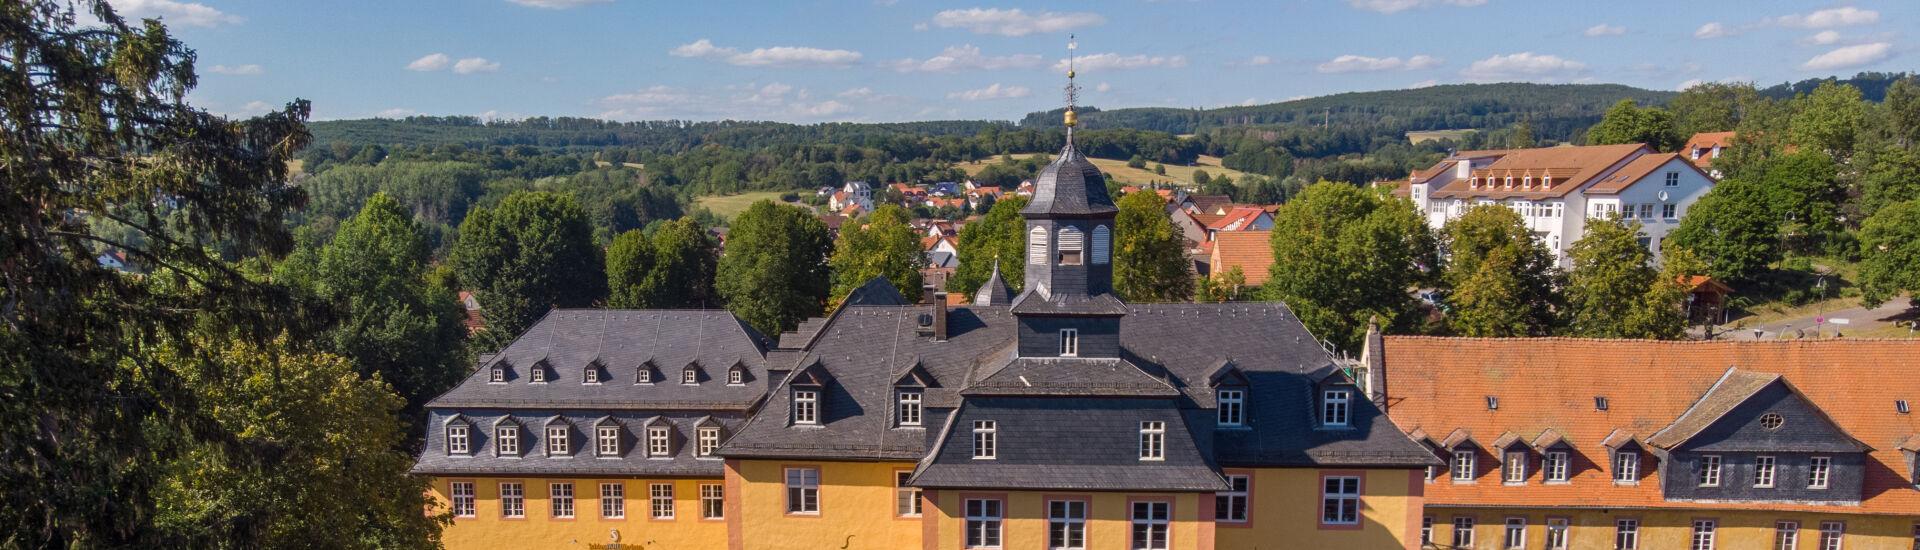 Luftbild Schloss Gedern